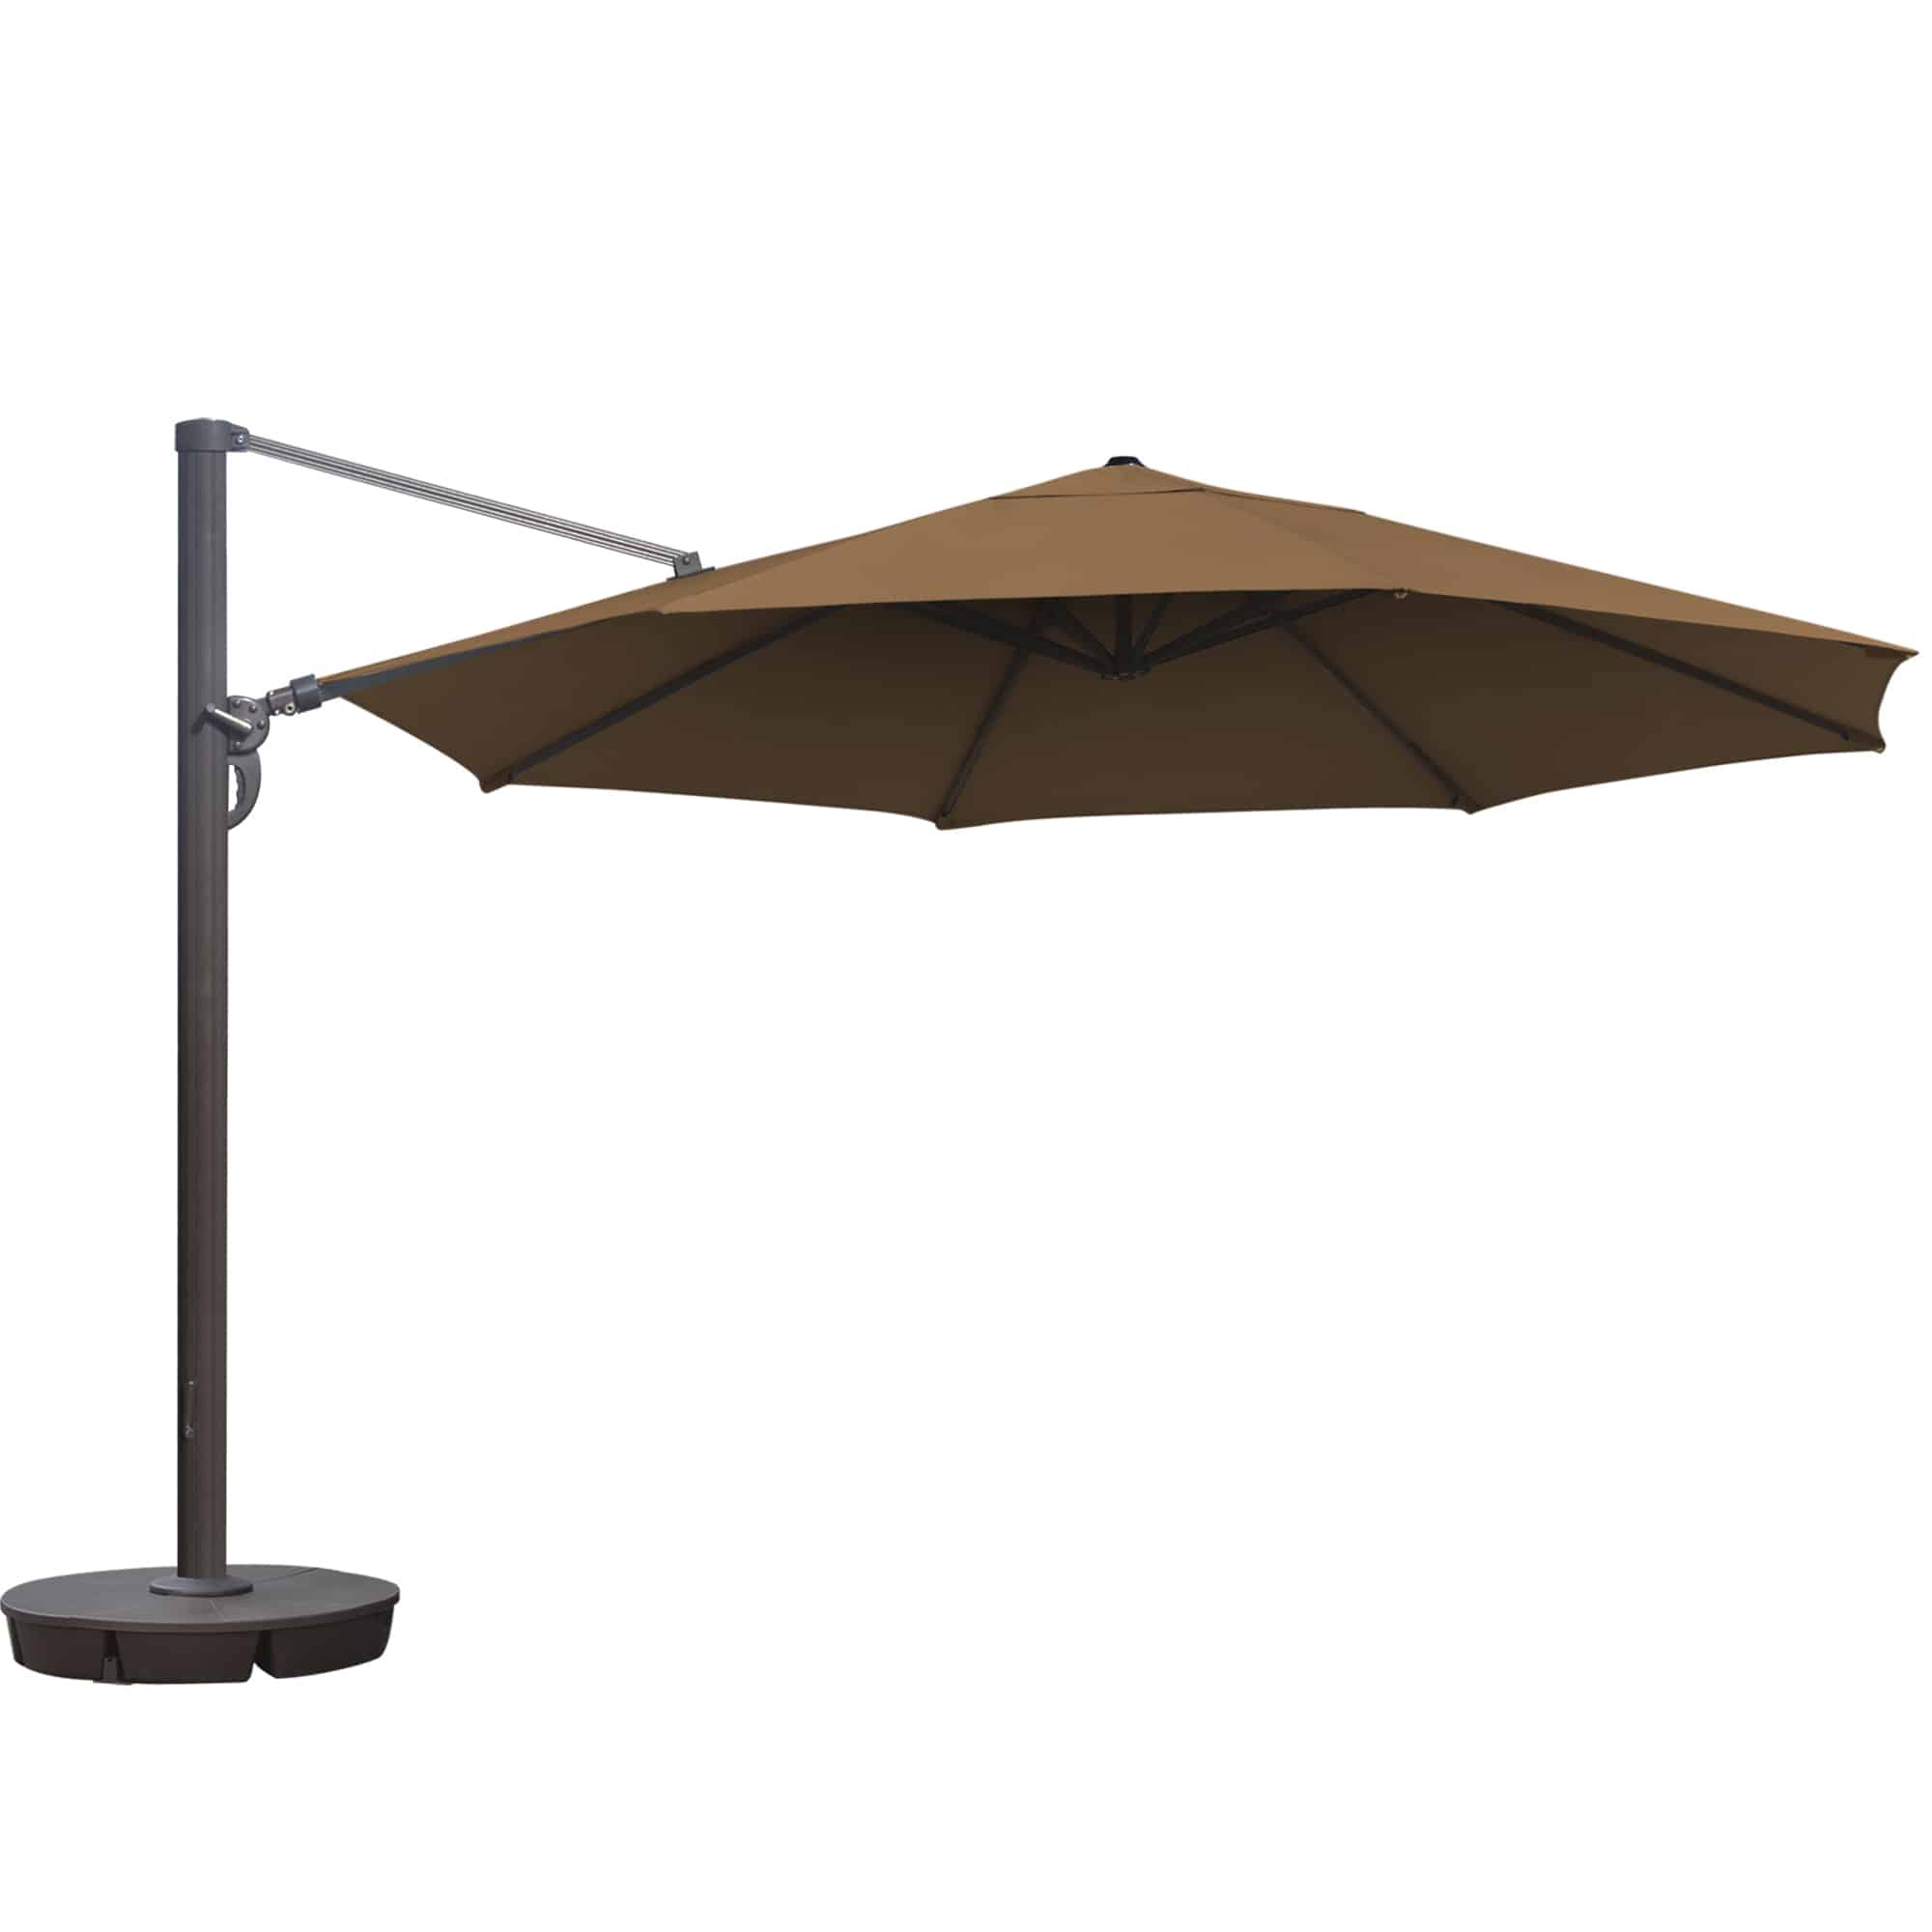 Victoria 13 Ft Octagonal Cantilever Patio Umbrella In Sunbrella Acrylic Pool Warehouse